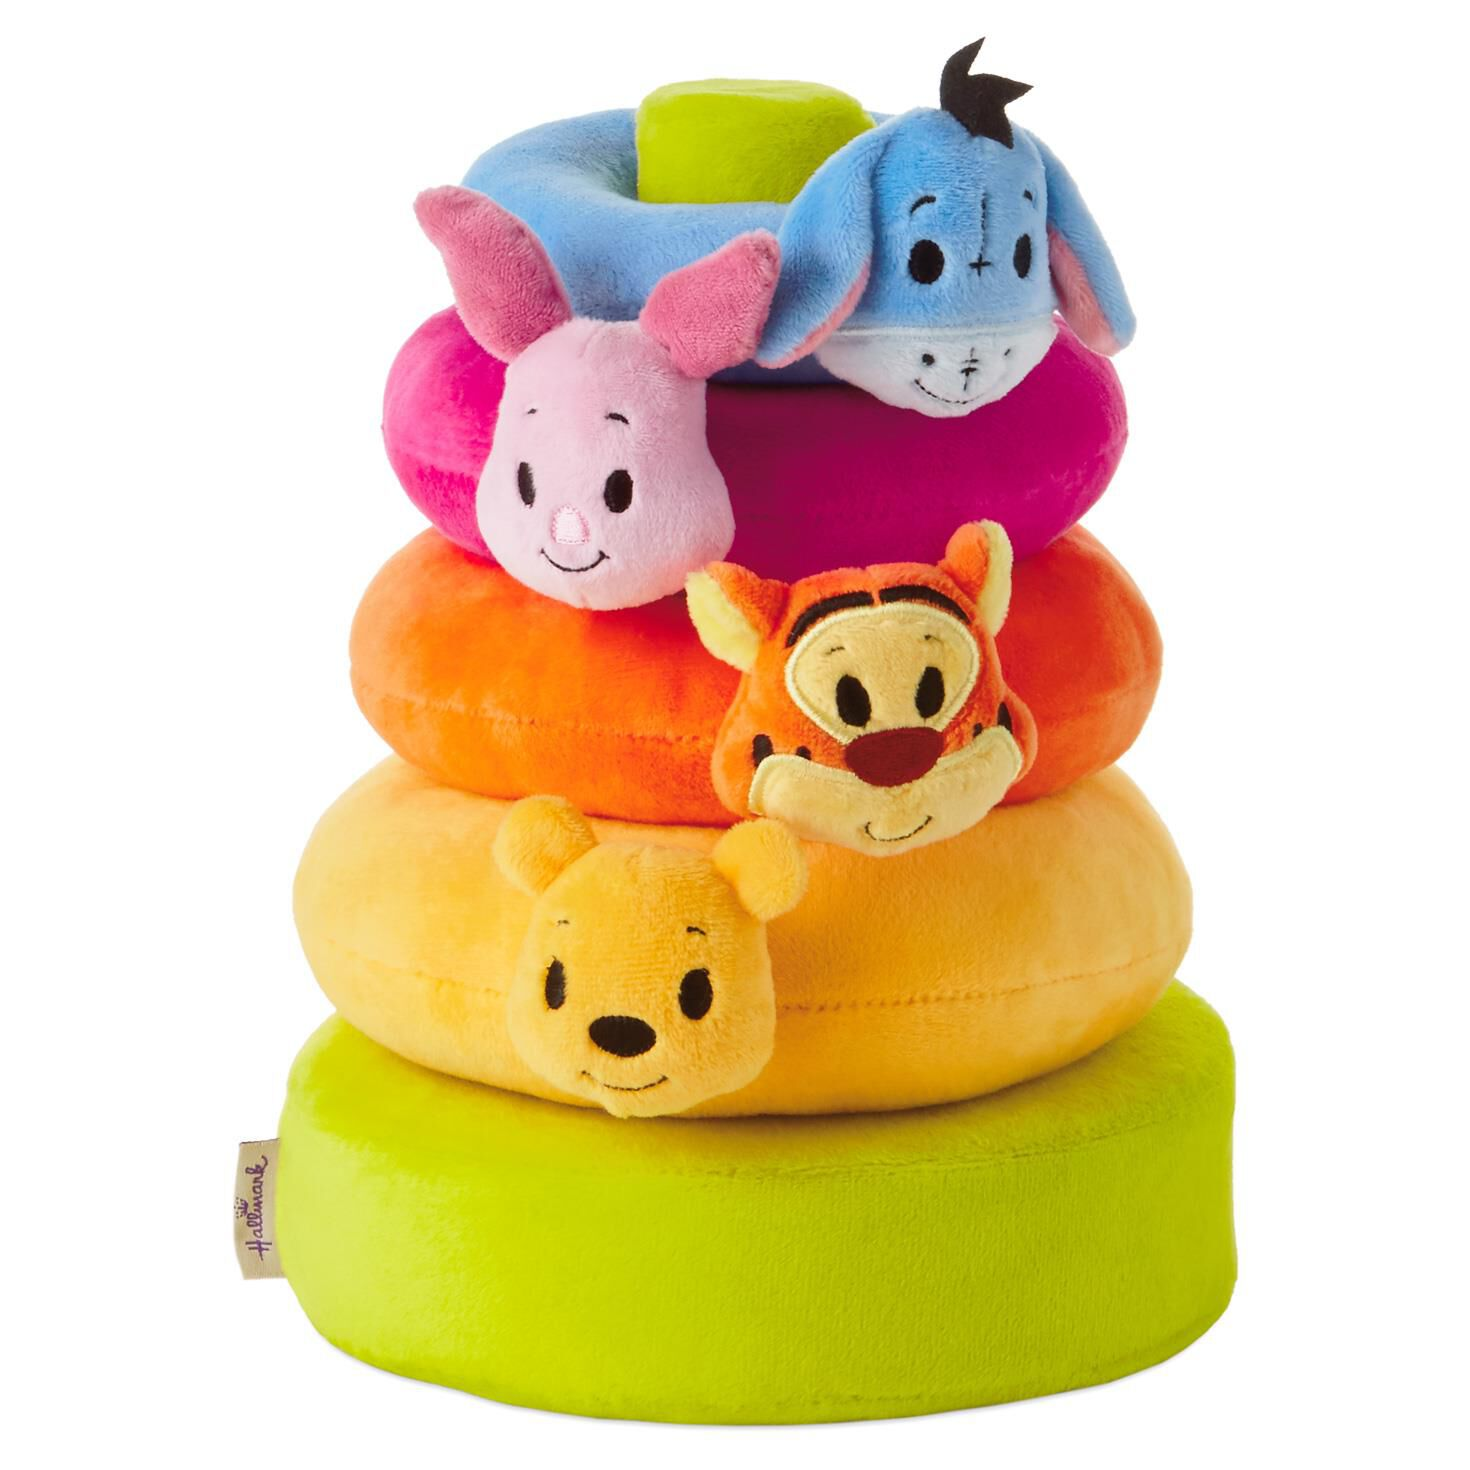 itty bittys® Winnie the Pooh Baby Stuffed Animal Stacker - Baby Essentials  - Hallmark 0aa50cfefb5a